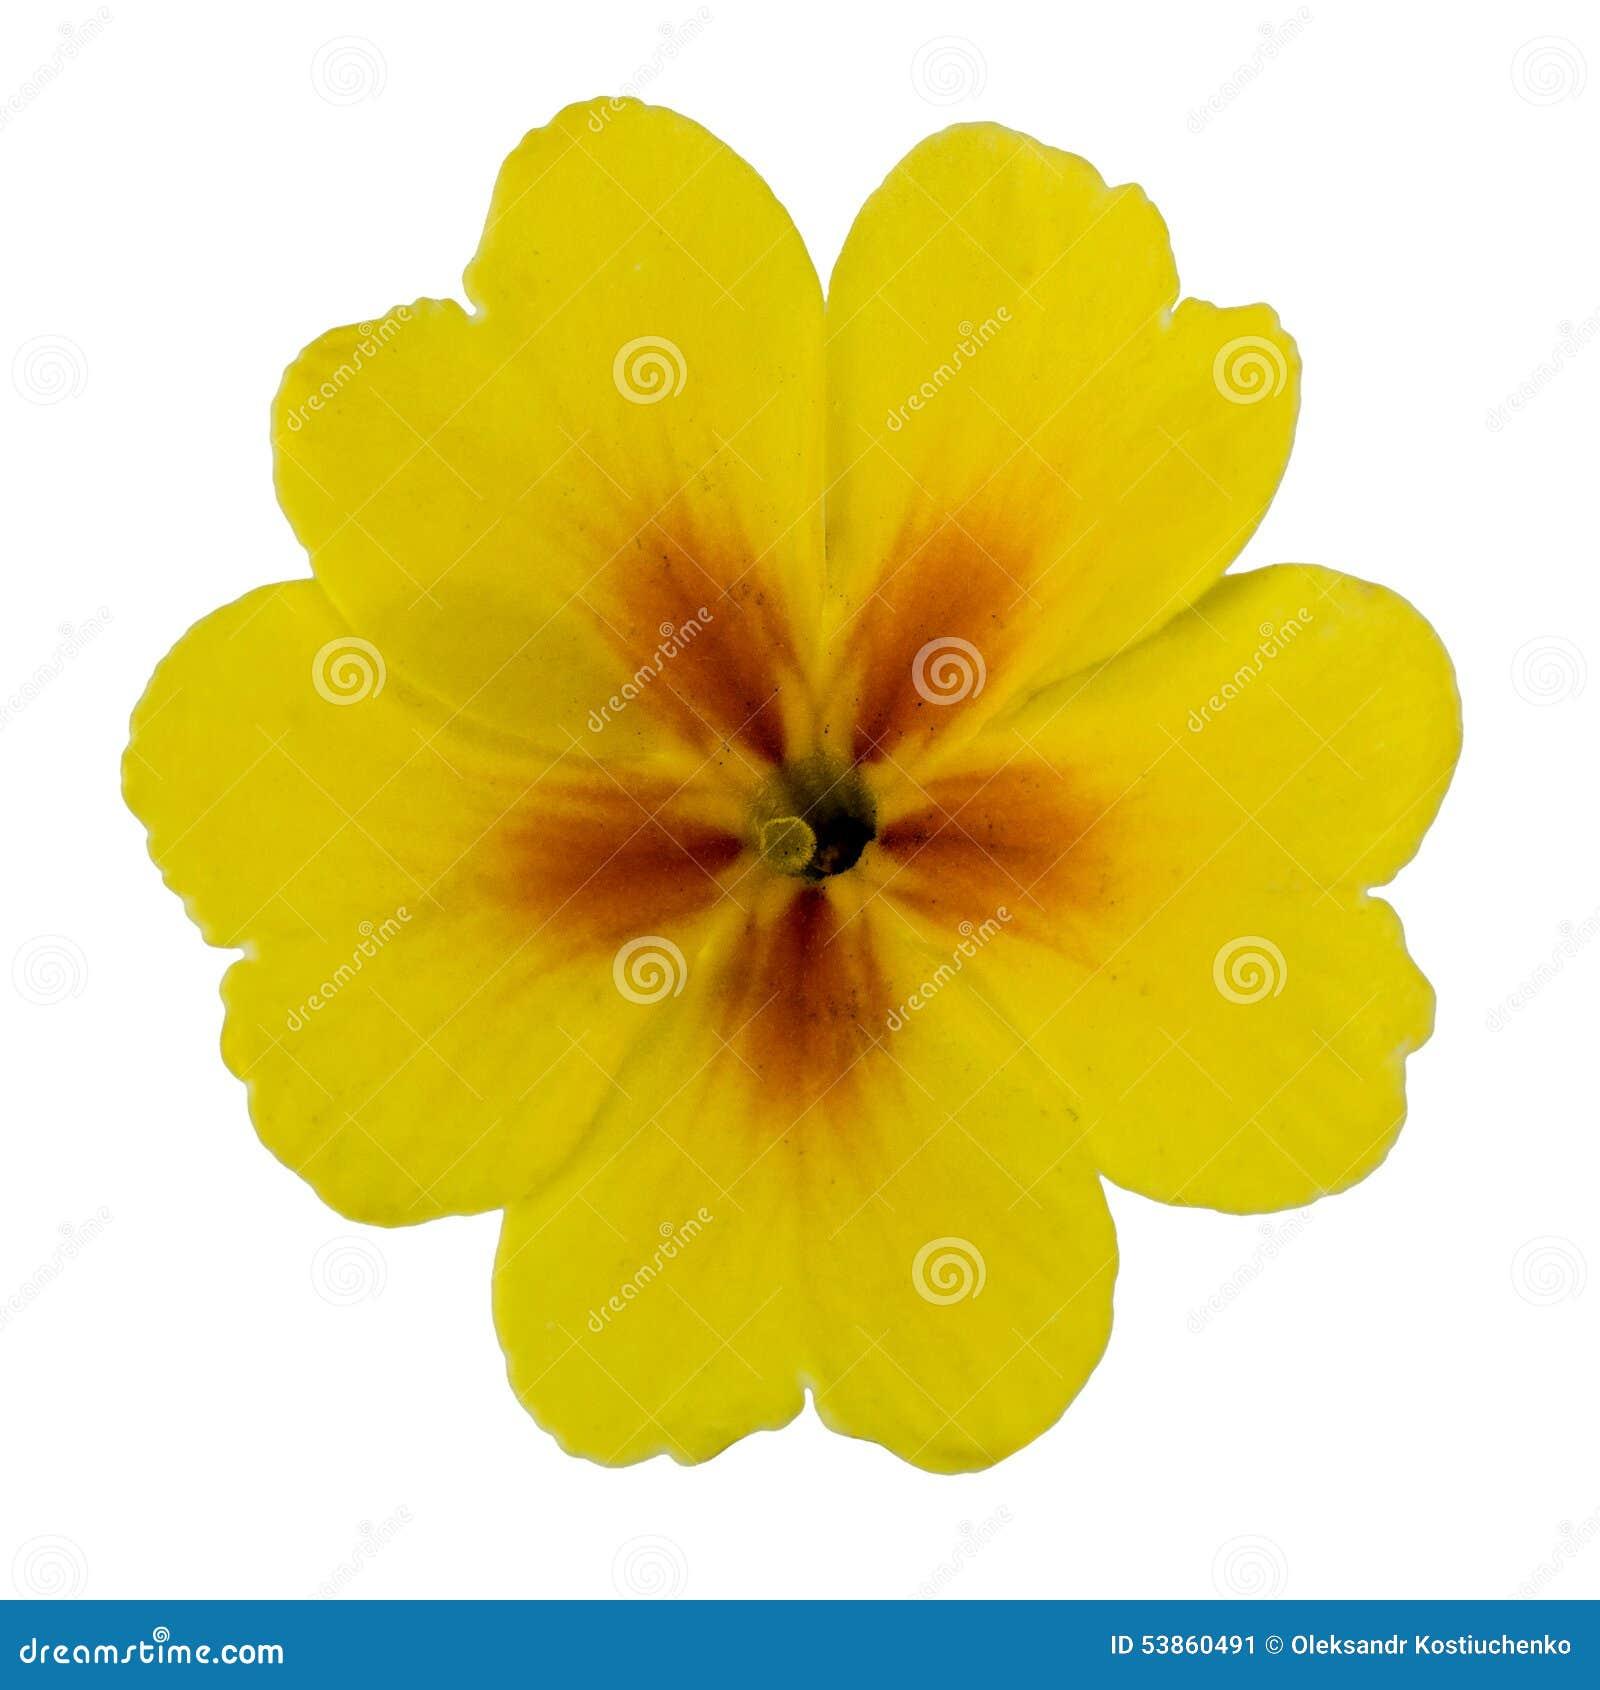 Flower Of Yellow Primrose Isolated On White Background Stock Image